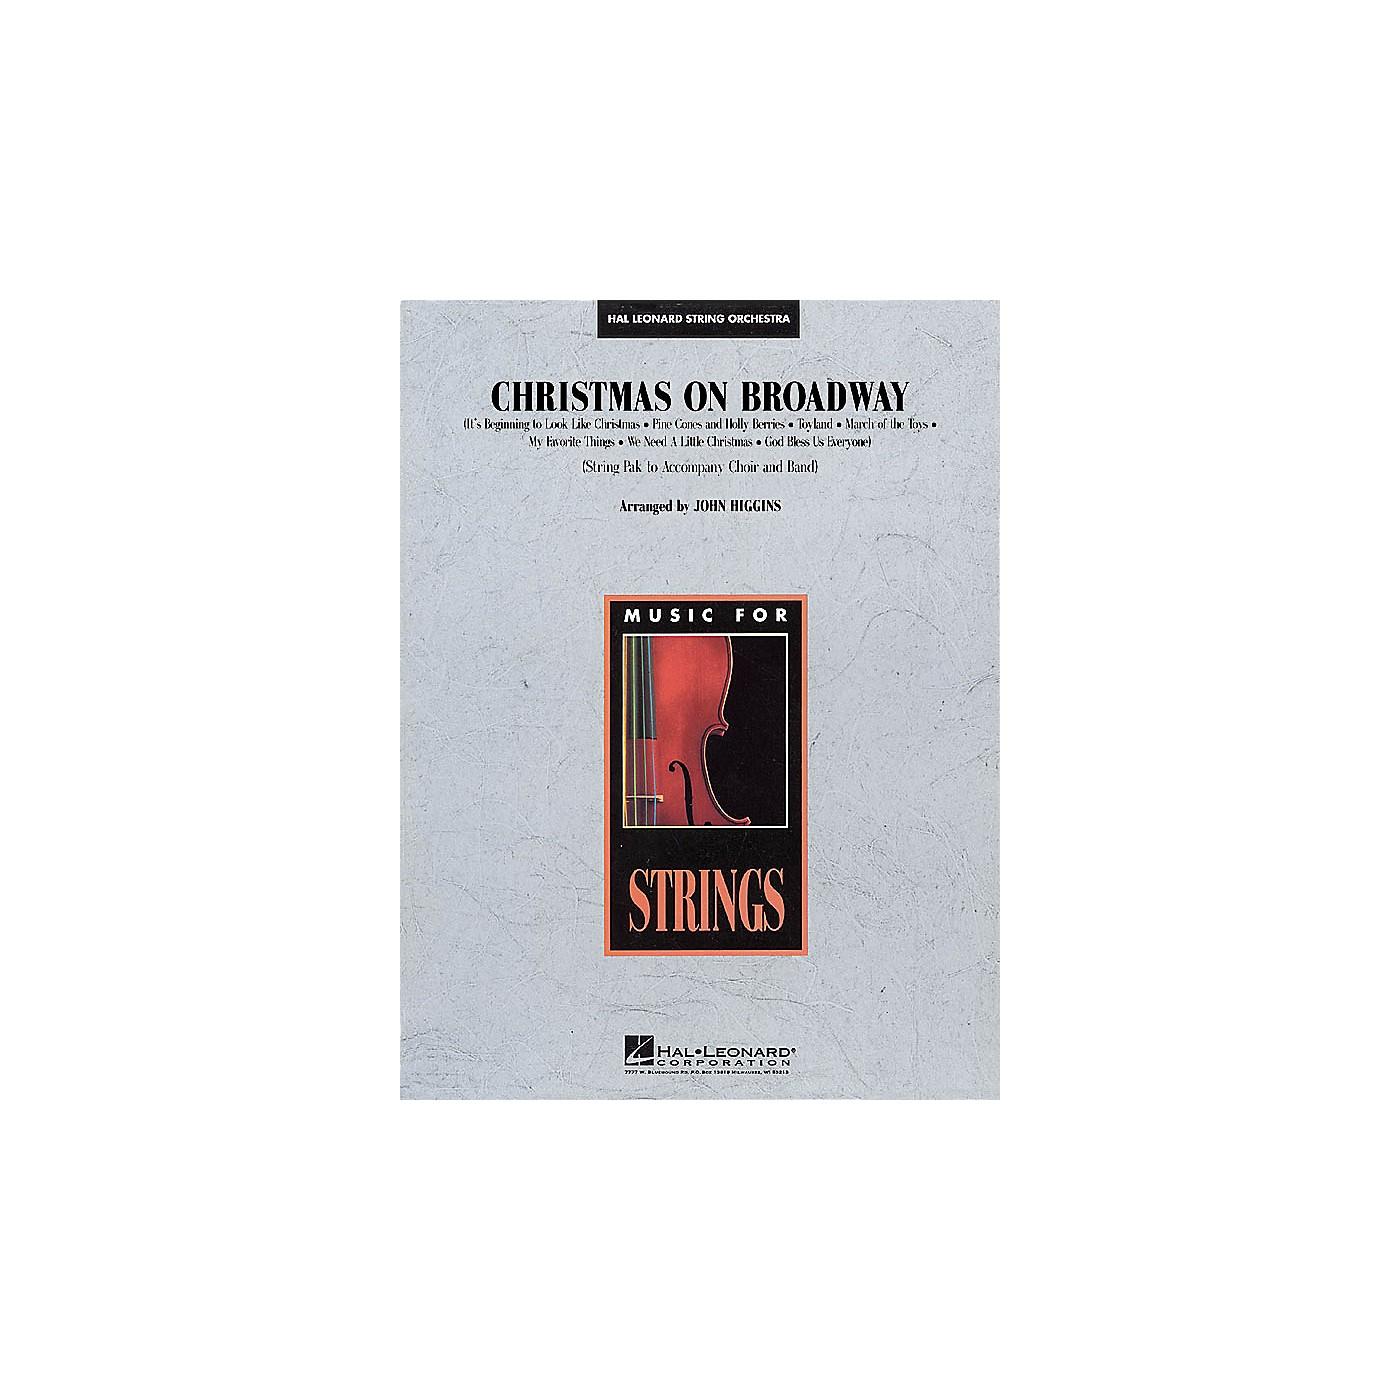 Hal Leonard Christmas on Broadway Medley (String Pak to Accompany Band and Choir) Arranged by John Higgins thumbnail